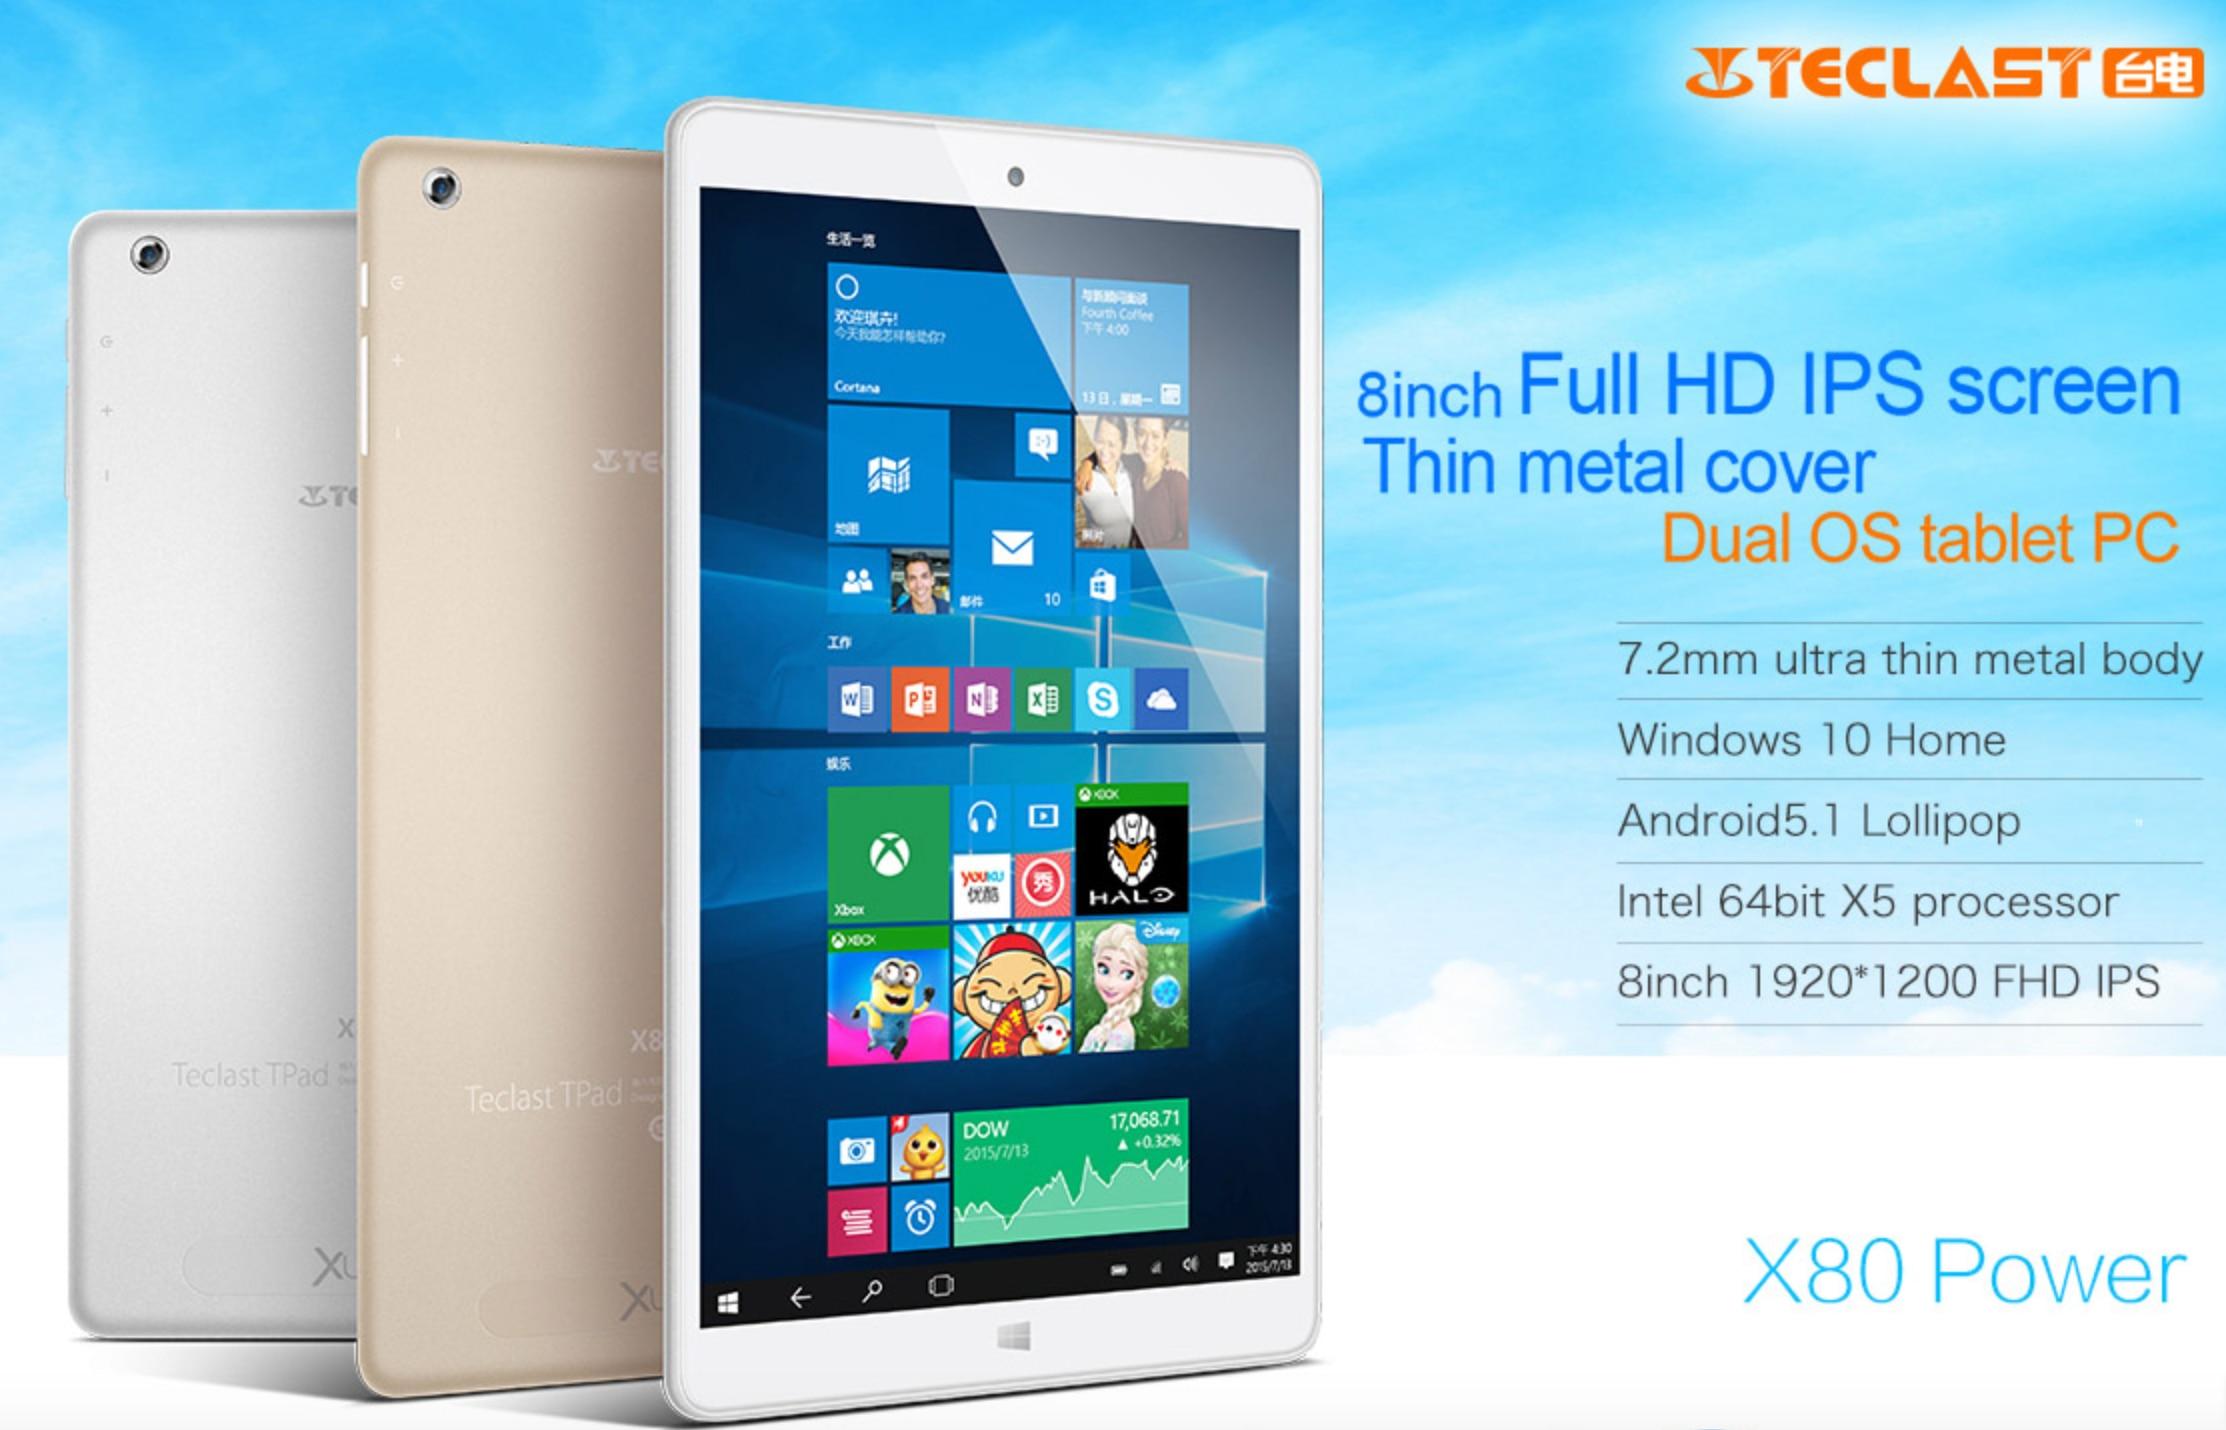 Teclast X80 Power 8.0'' Tablet PC Windows 10 Android 5.1 2GB RAM 32GB ROM IPS Intel Cherry Trail Z8300 Quad Core 3800mAh Tablet